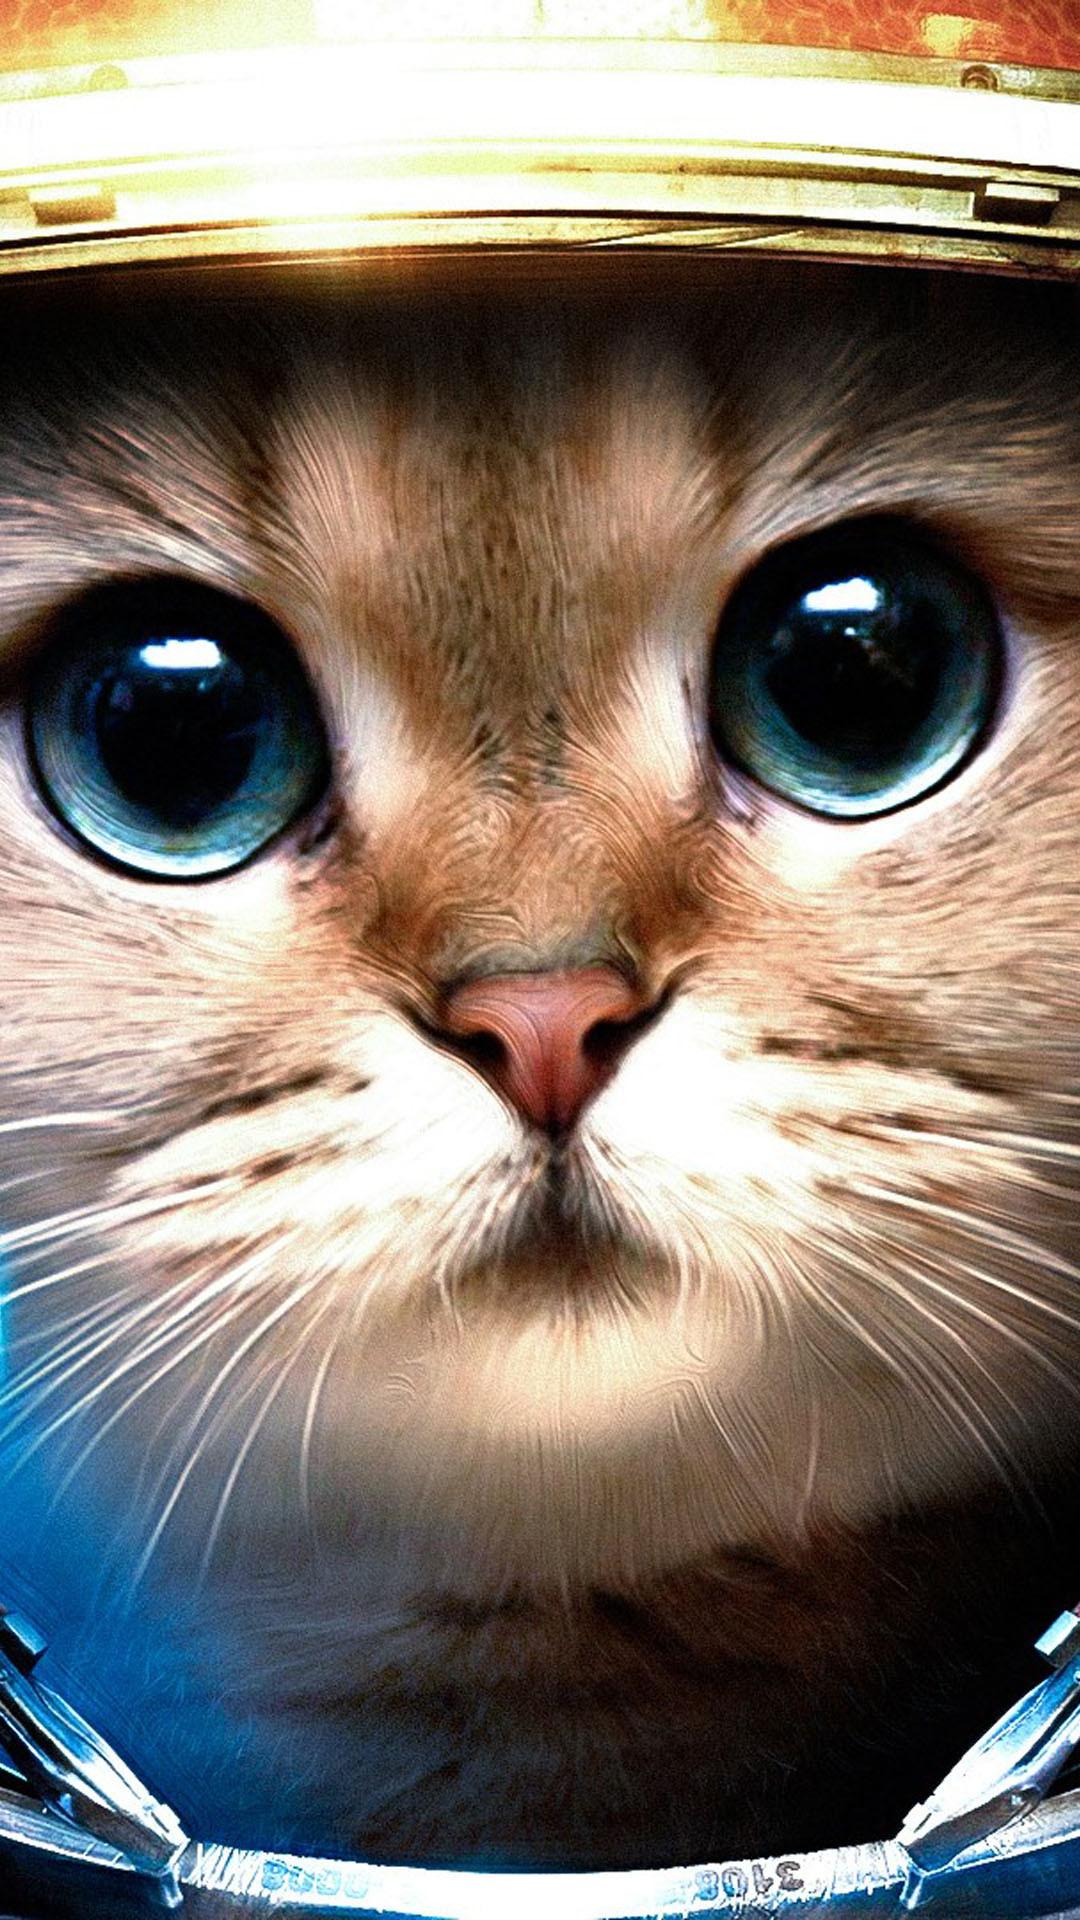 Res: 1080x1920, Marvelous Cat Iphone Backgrounds | Pixelstalk As Iphone 5 Space Cat  Wallpaper